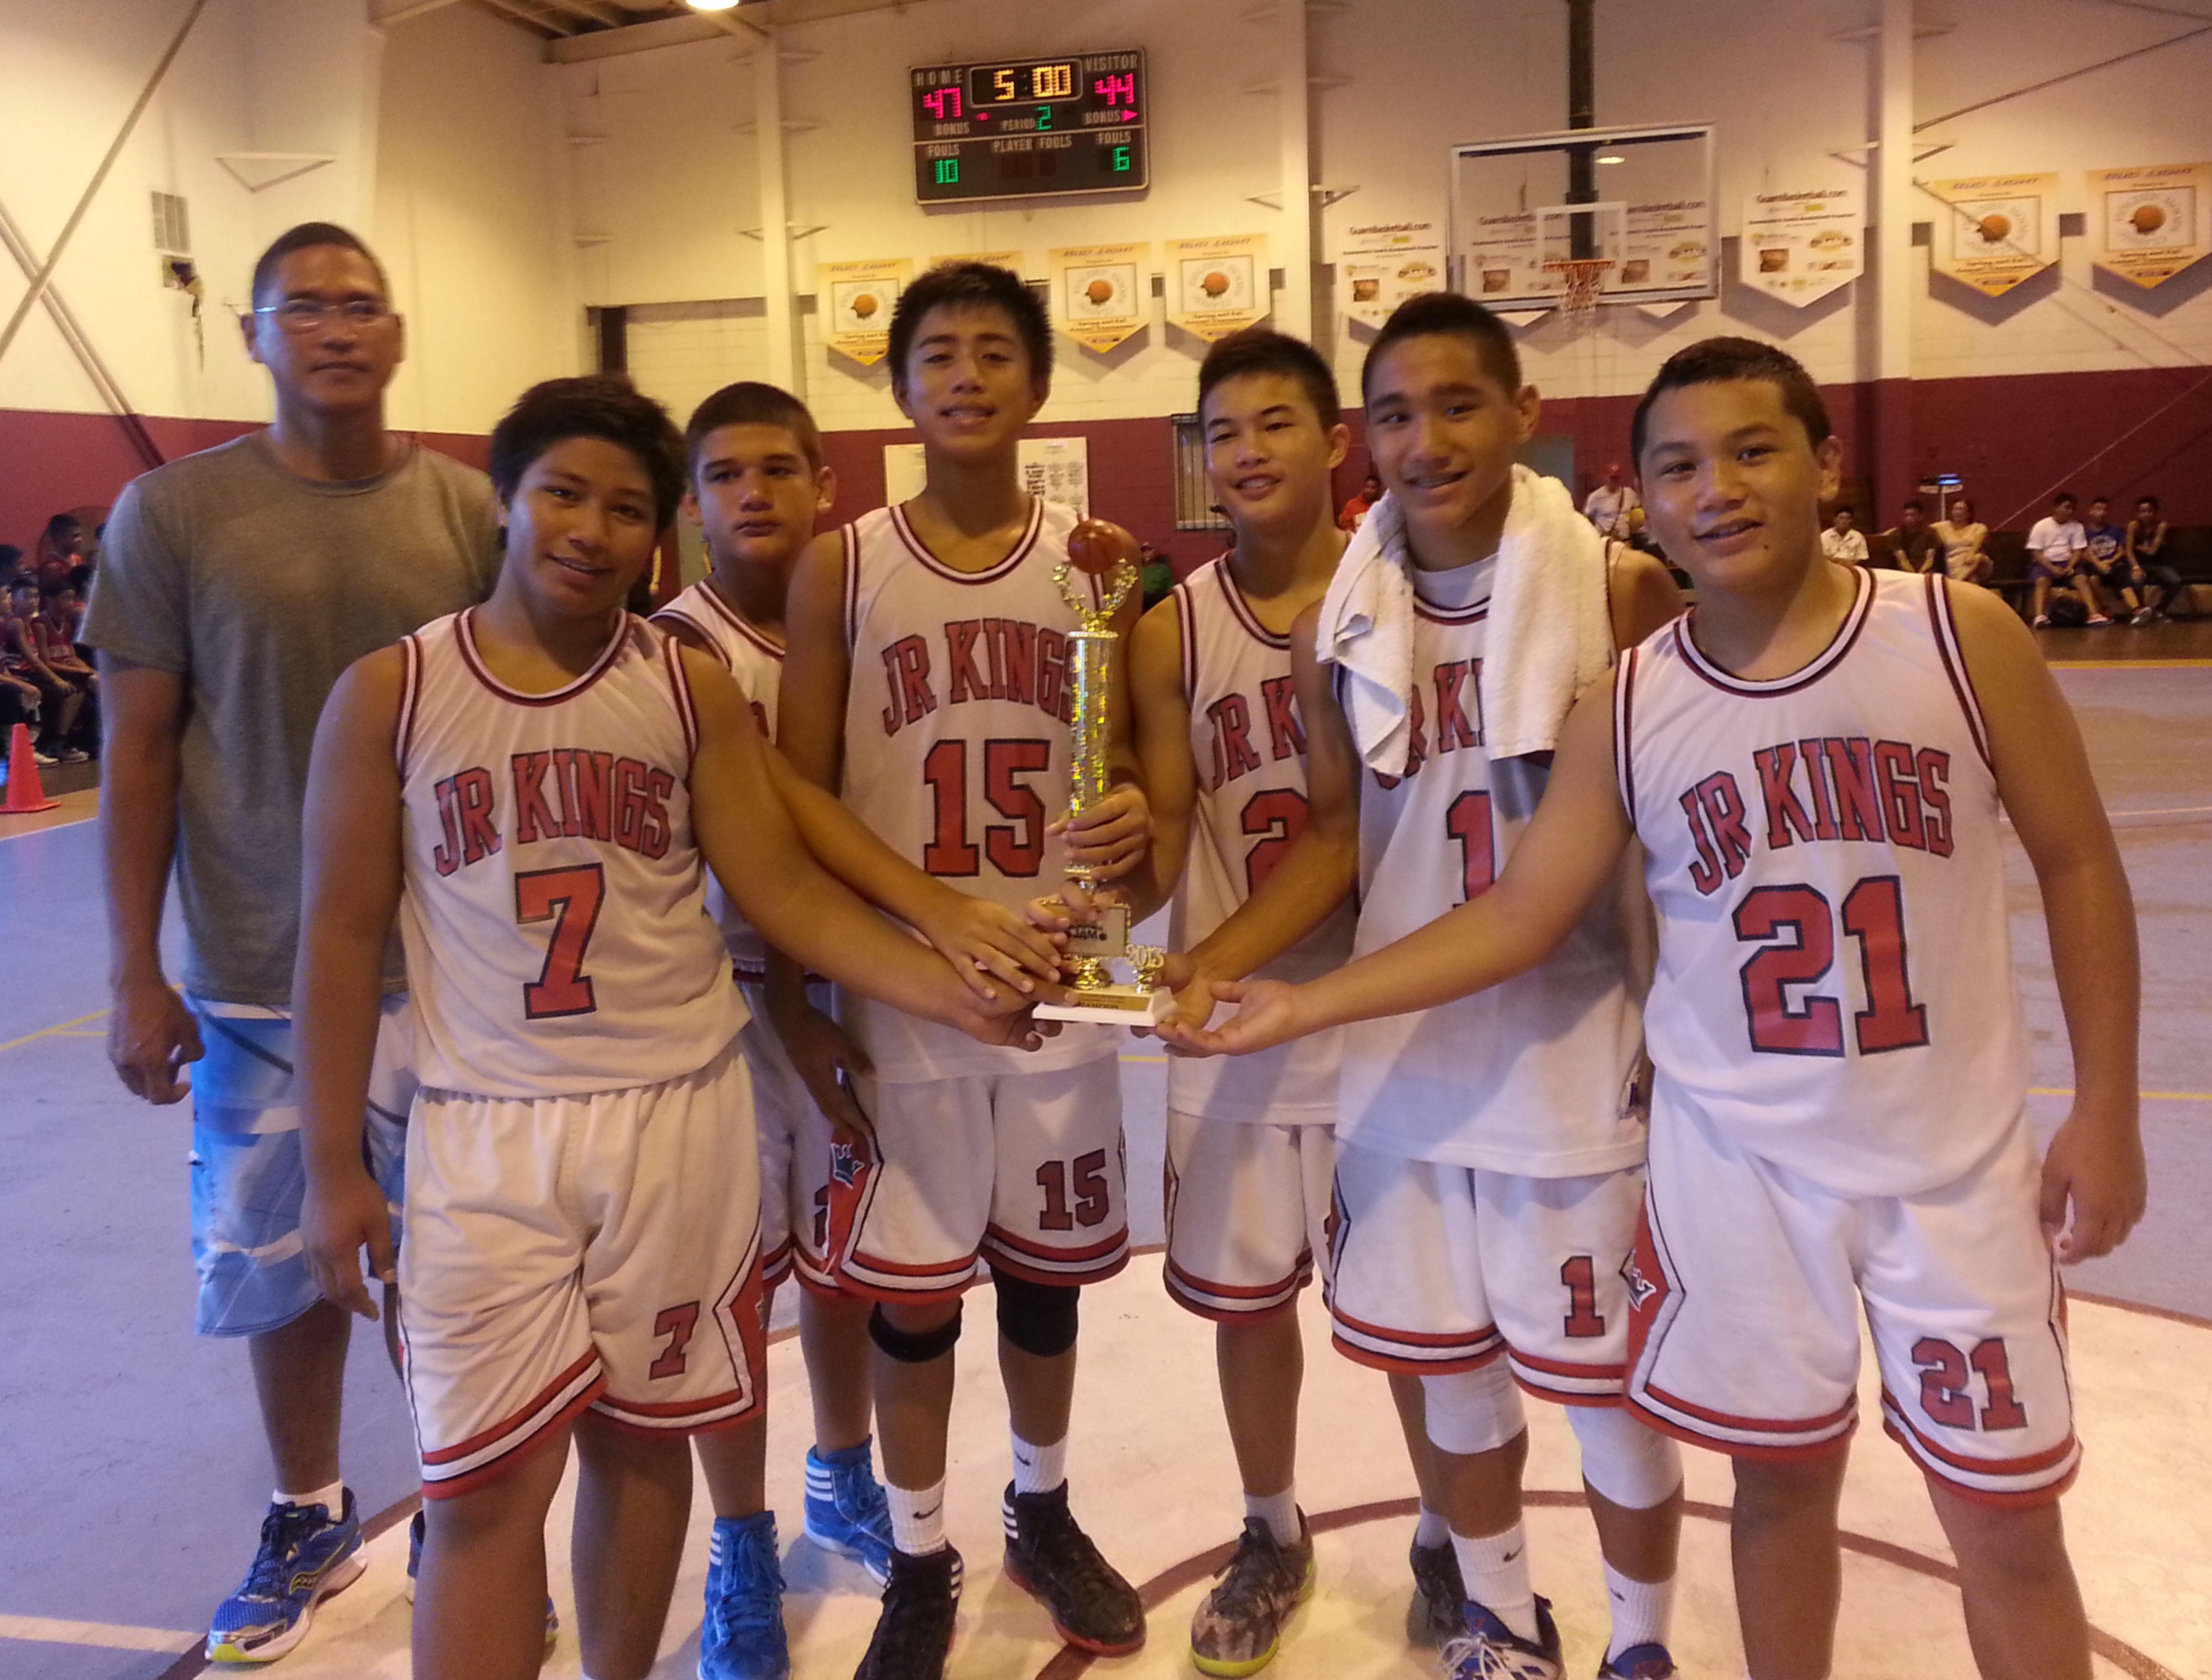 8-13-2013_14U_competitive_champions-JR_Kings